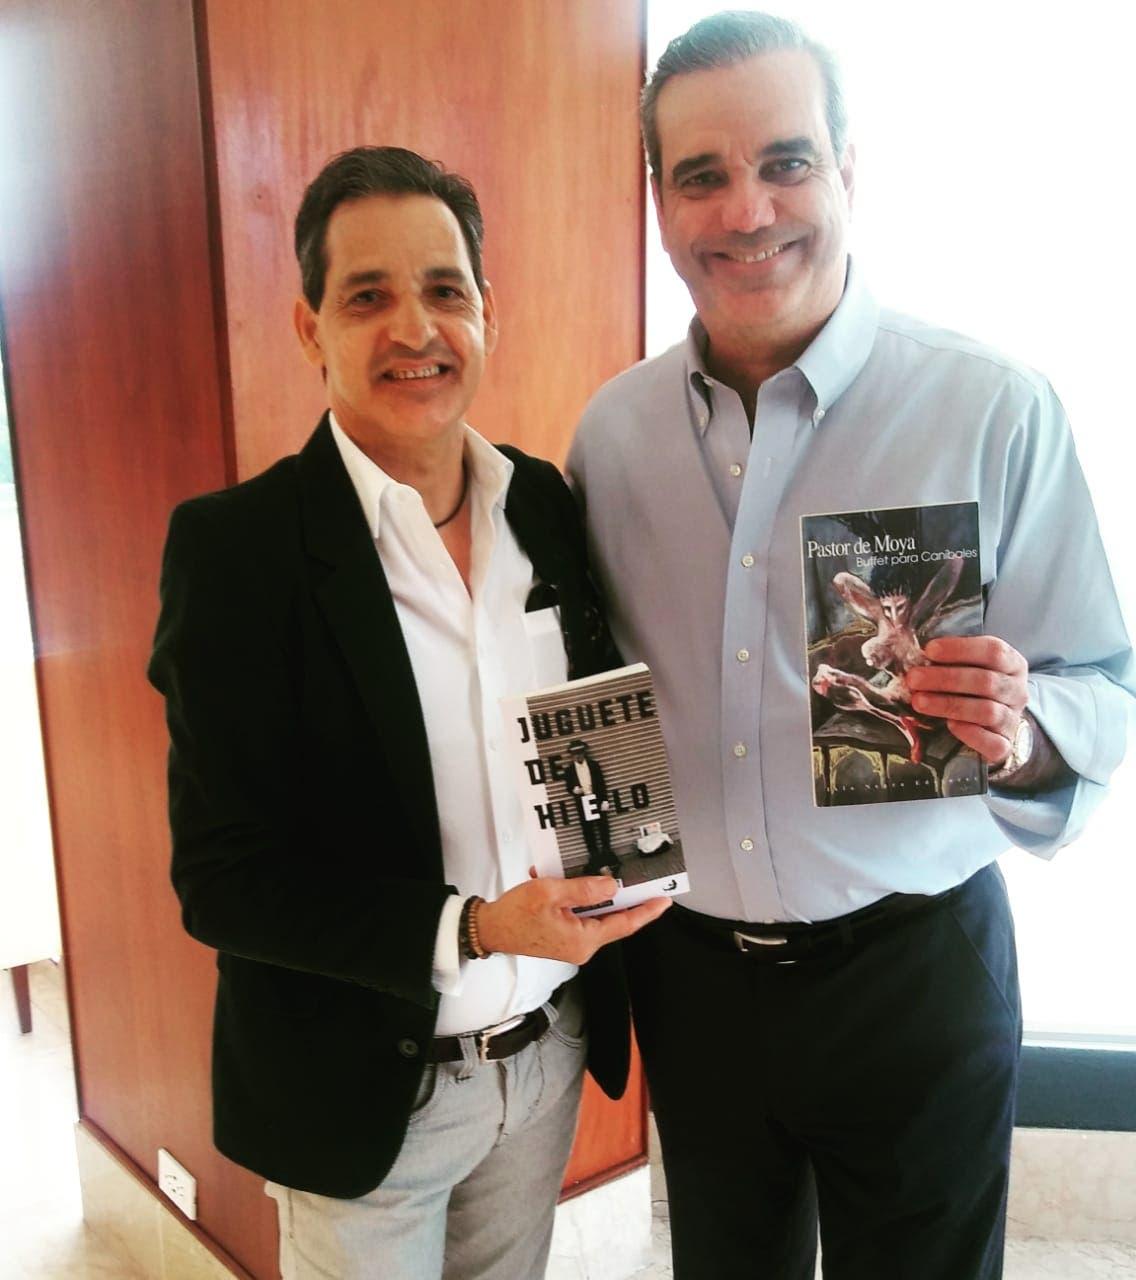 Luis Abinader designa a escritor Pastor De Moya como viceministro de Cultura